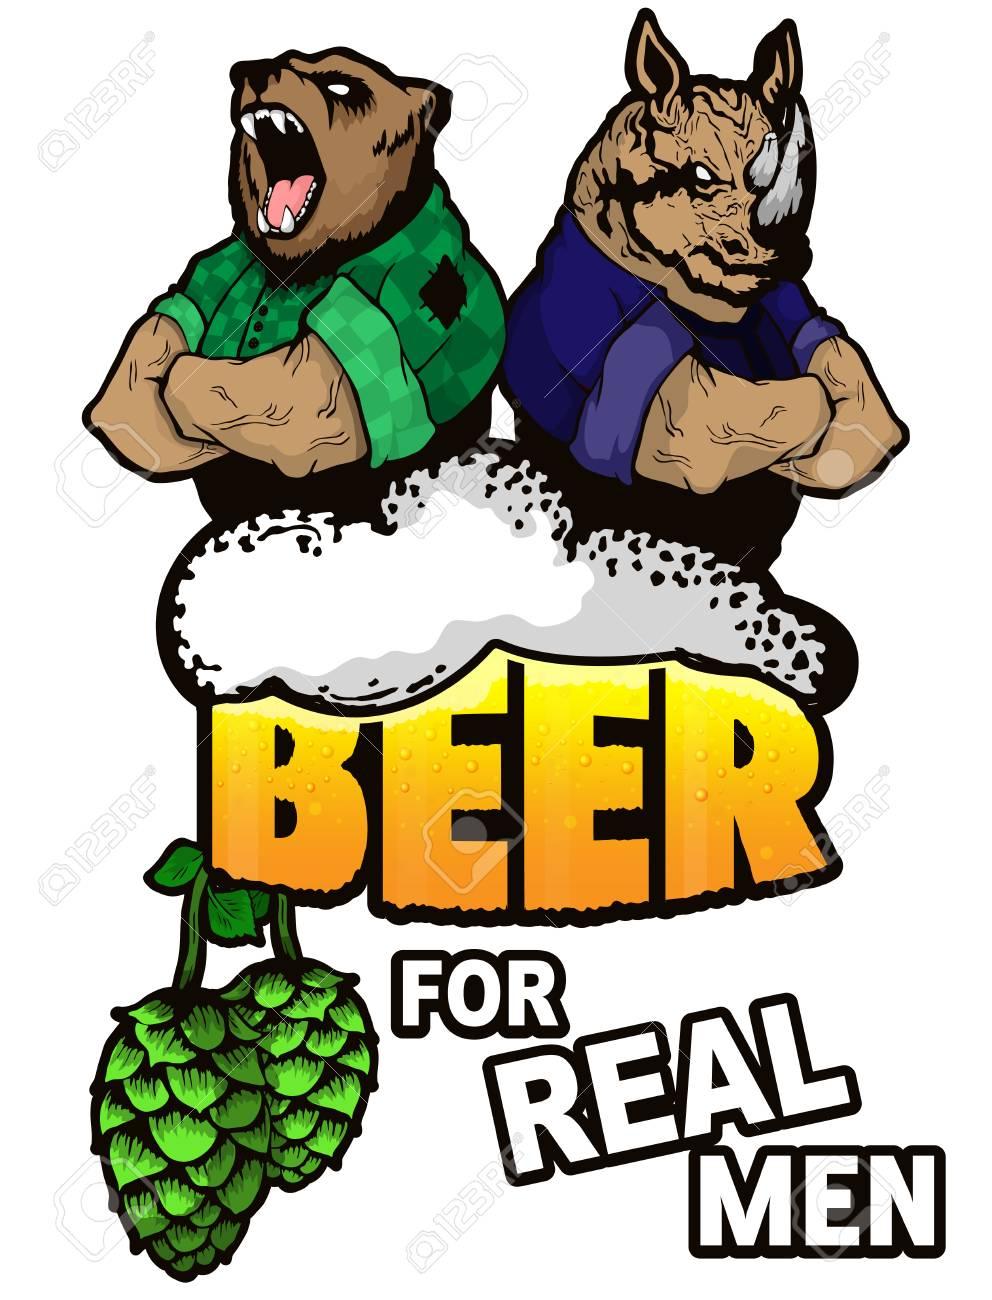 Real men breed